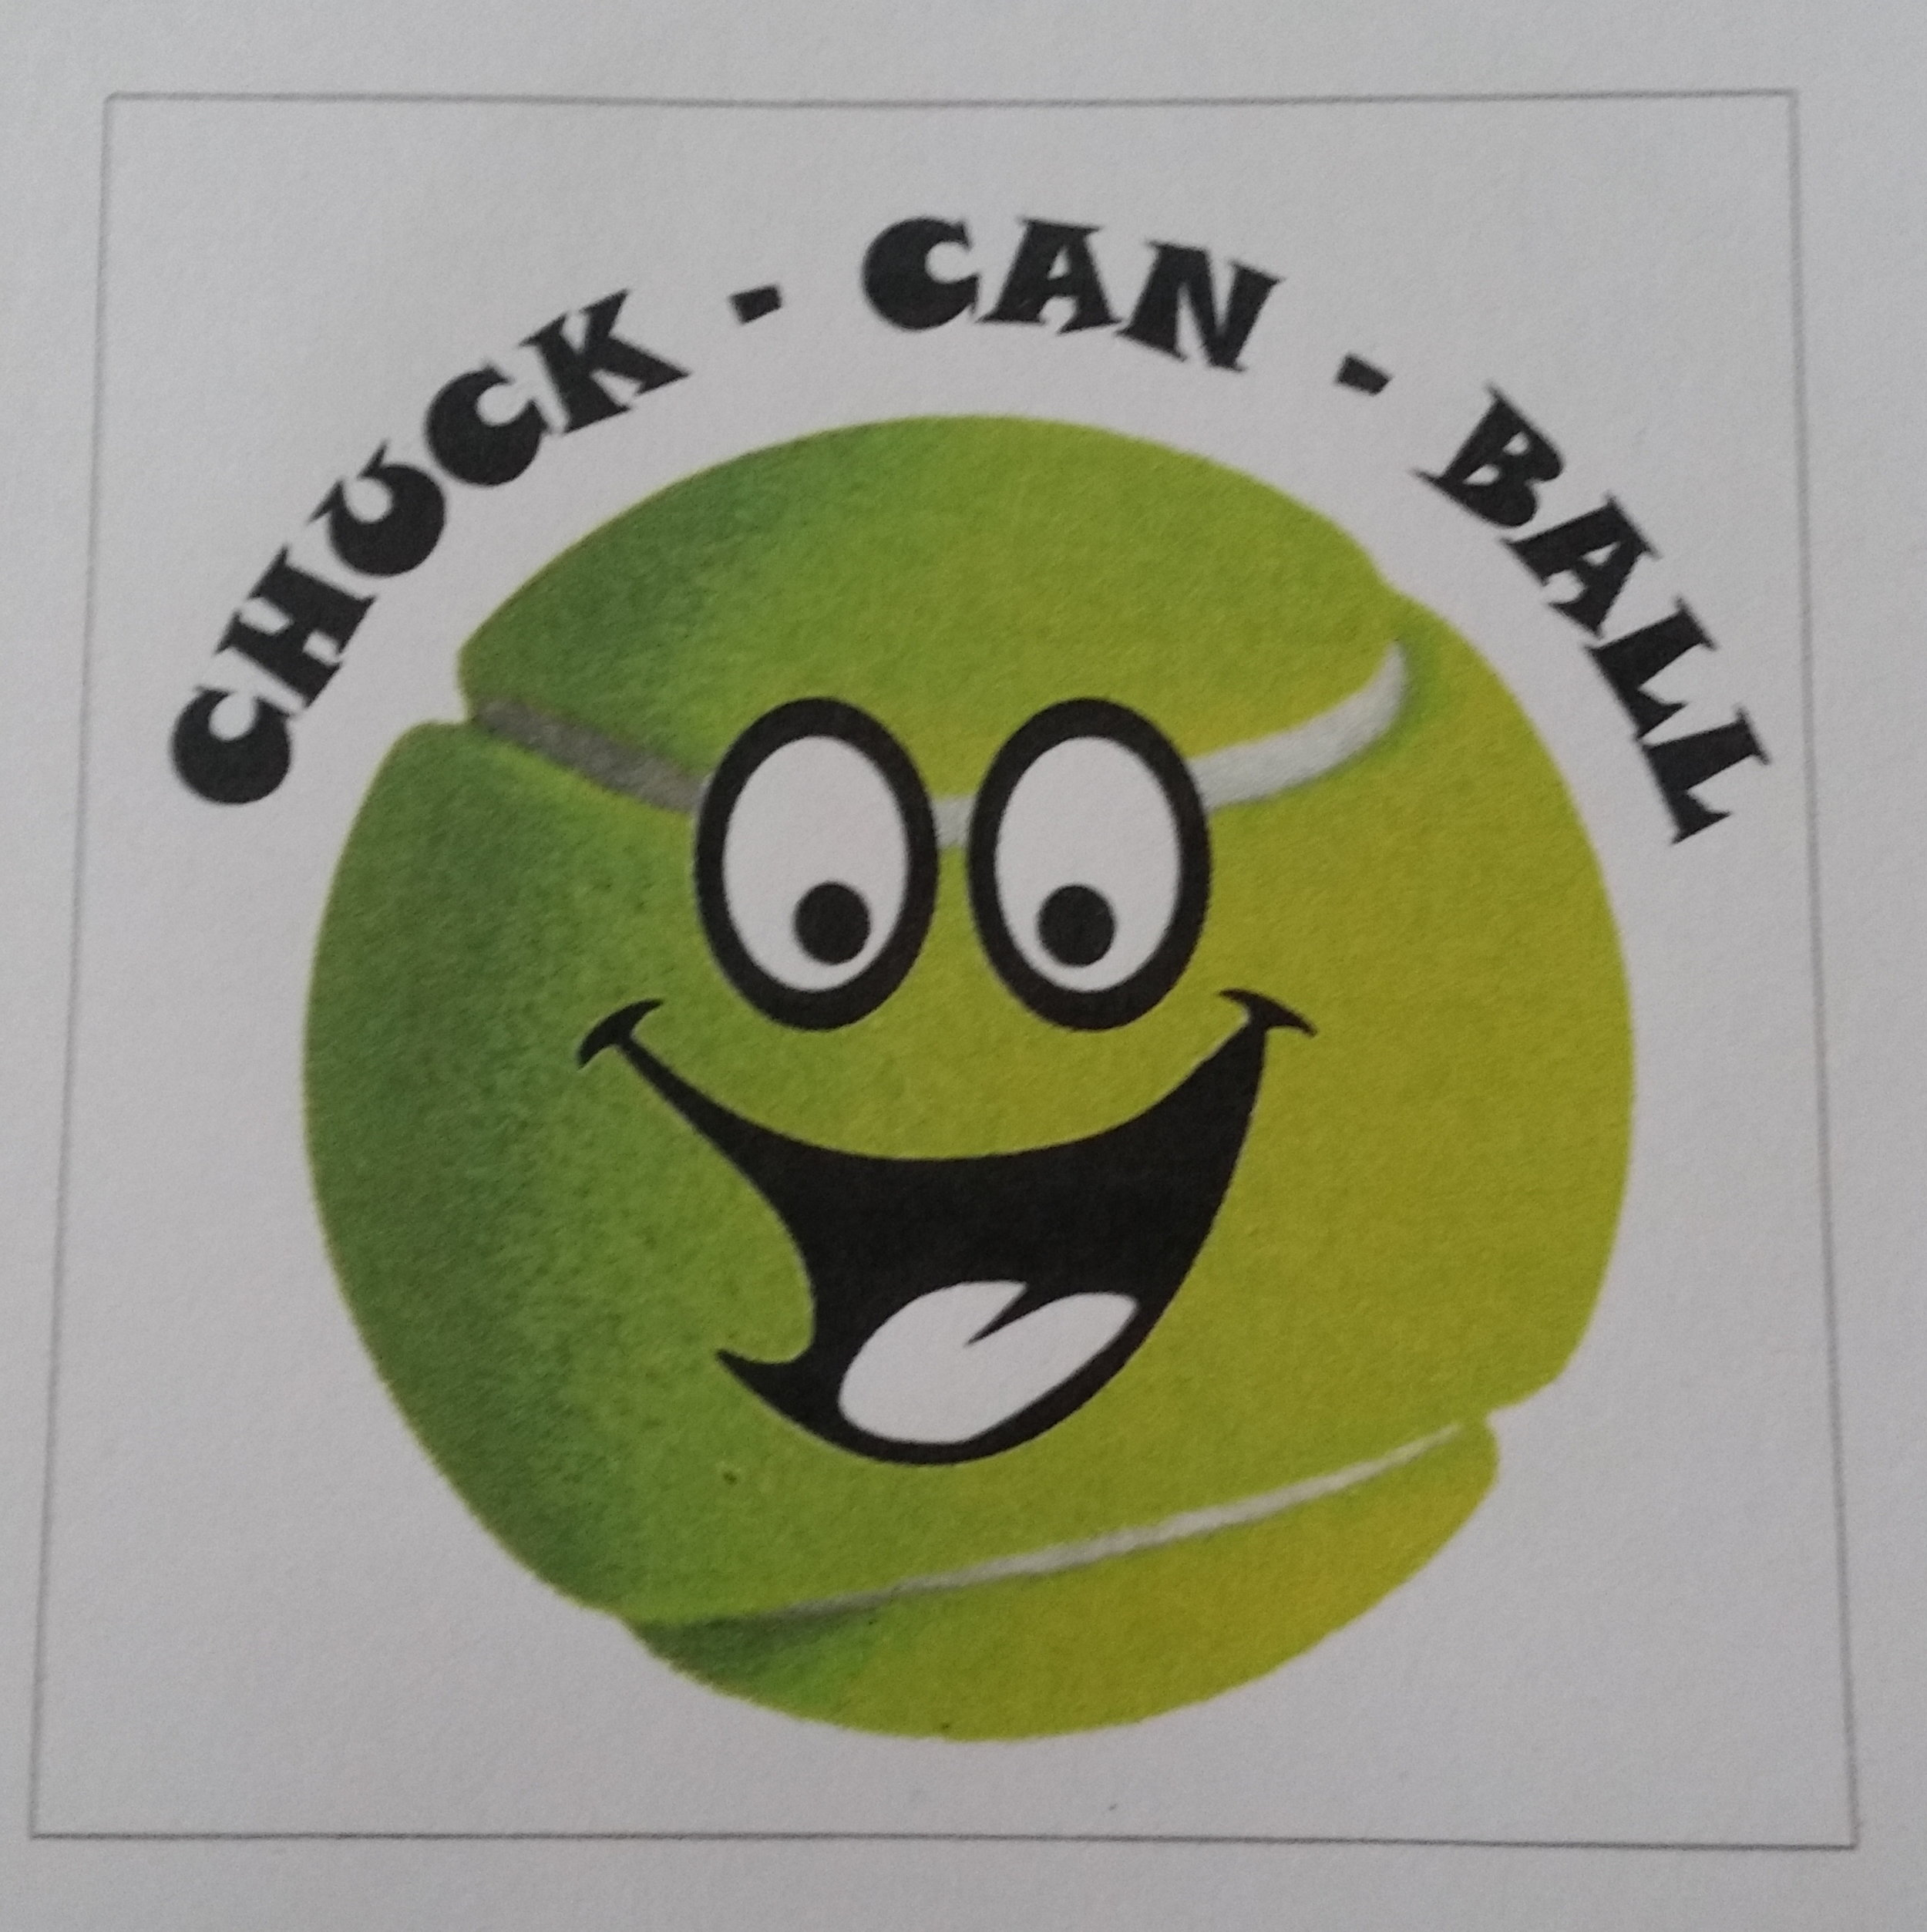 Chuck Can Ball.jpg